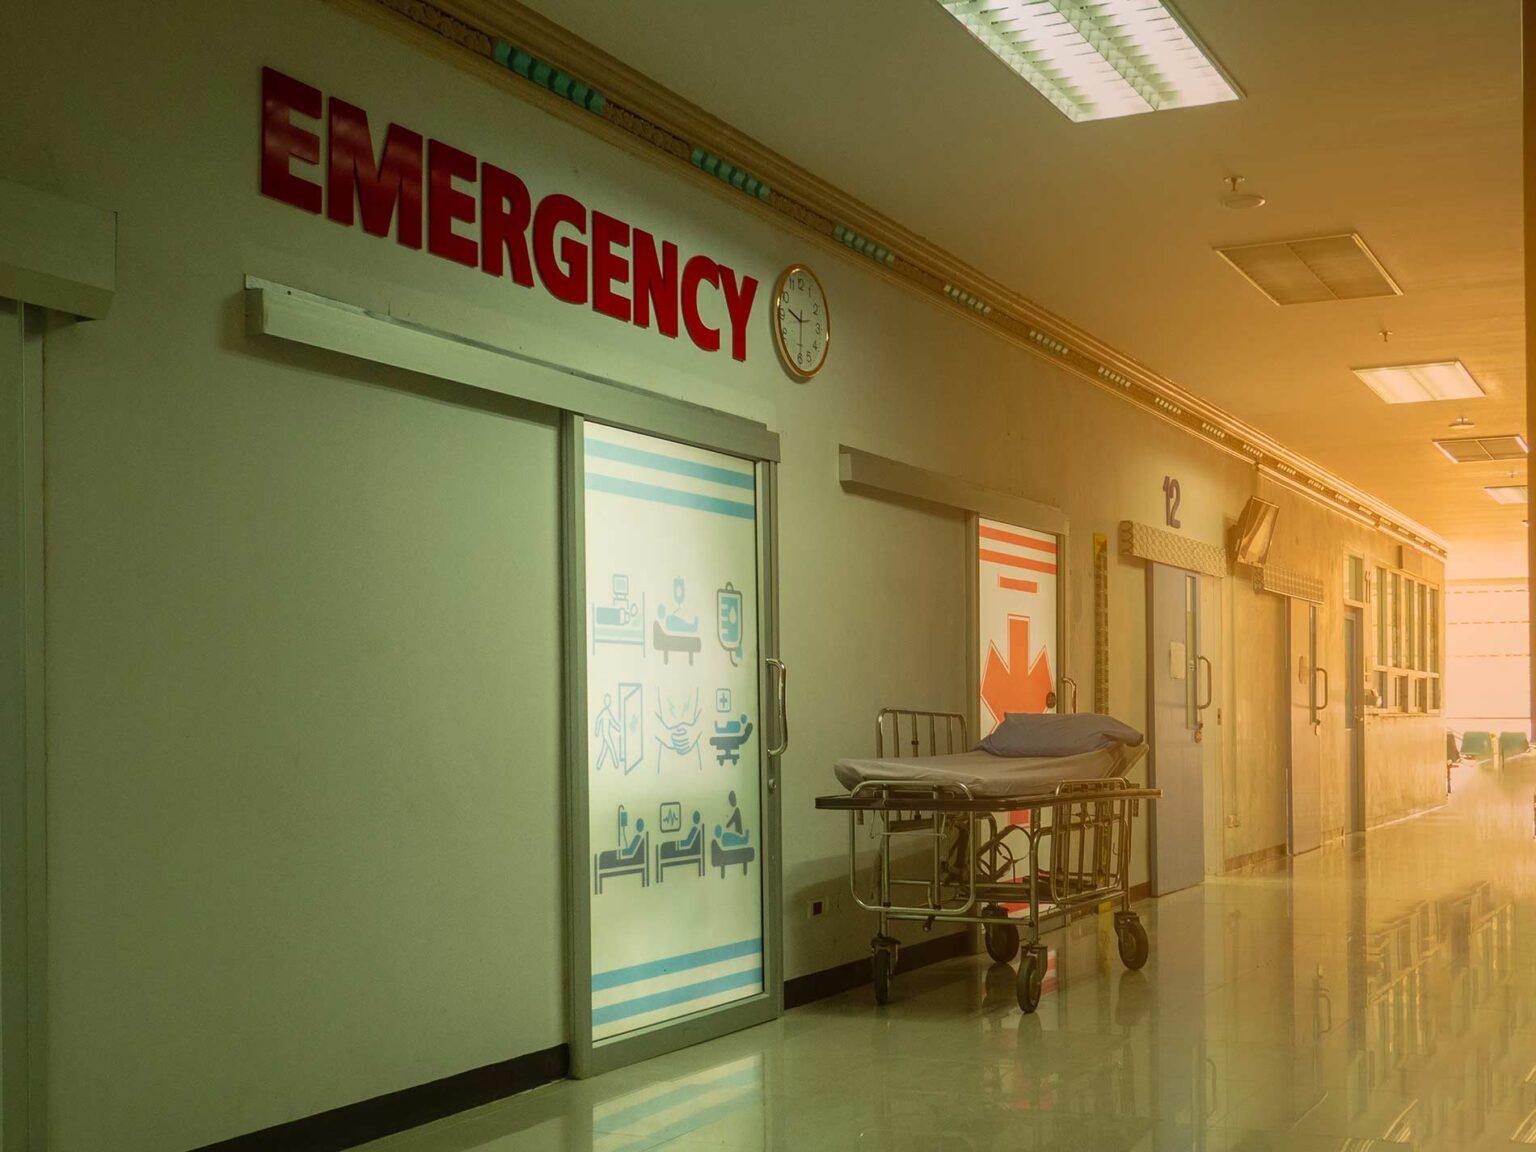 Emergency room price